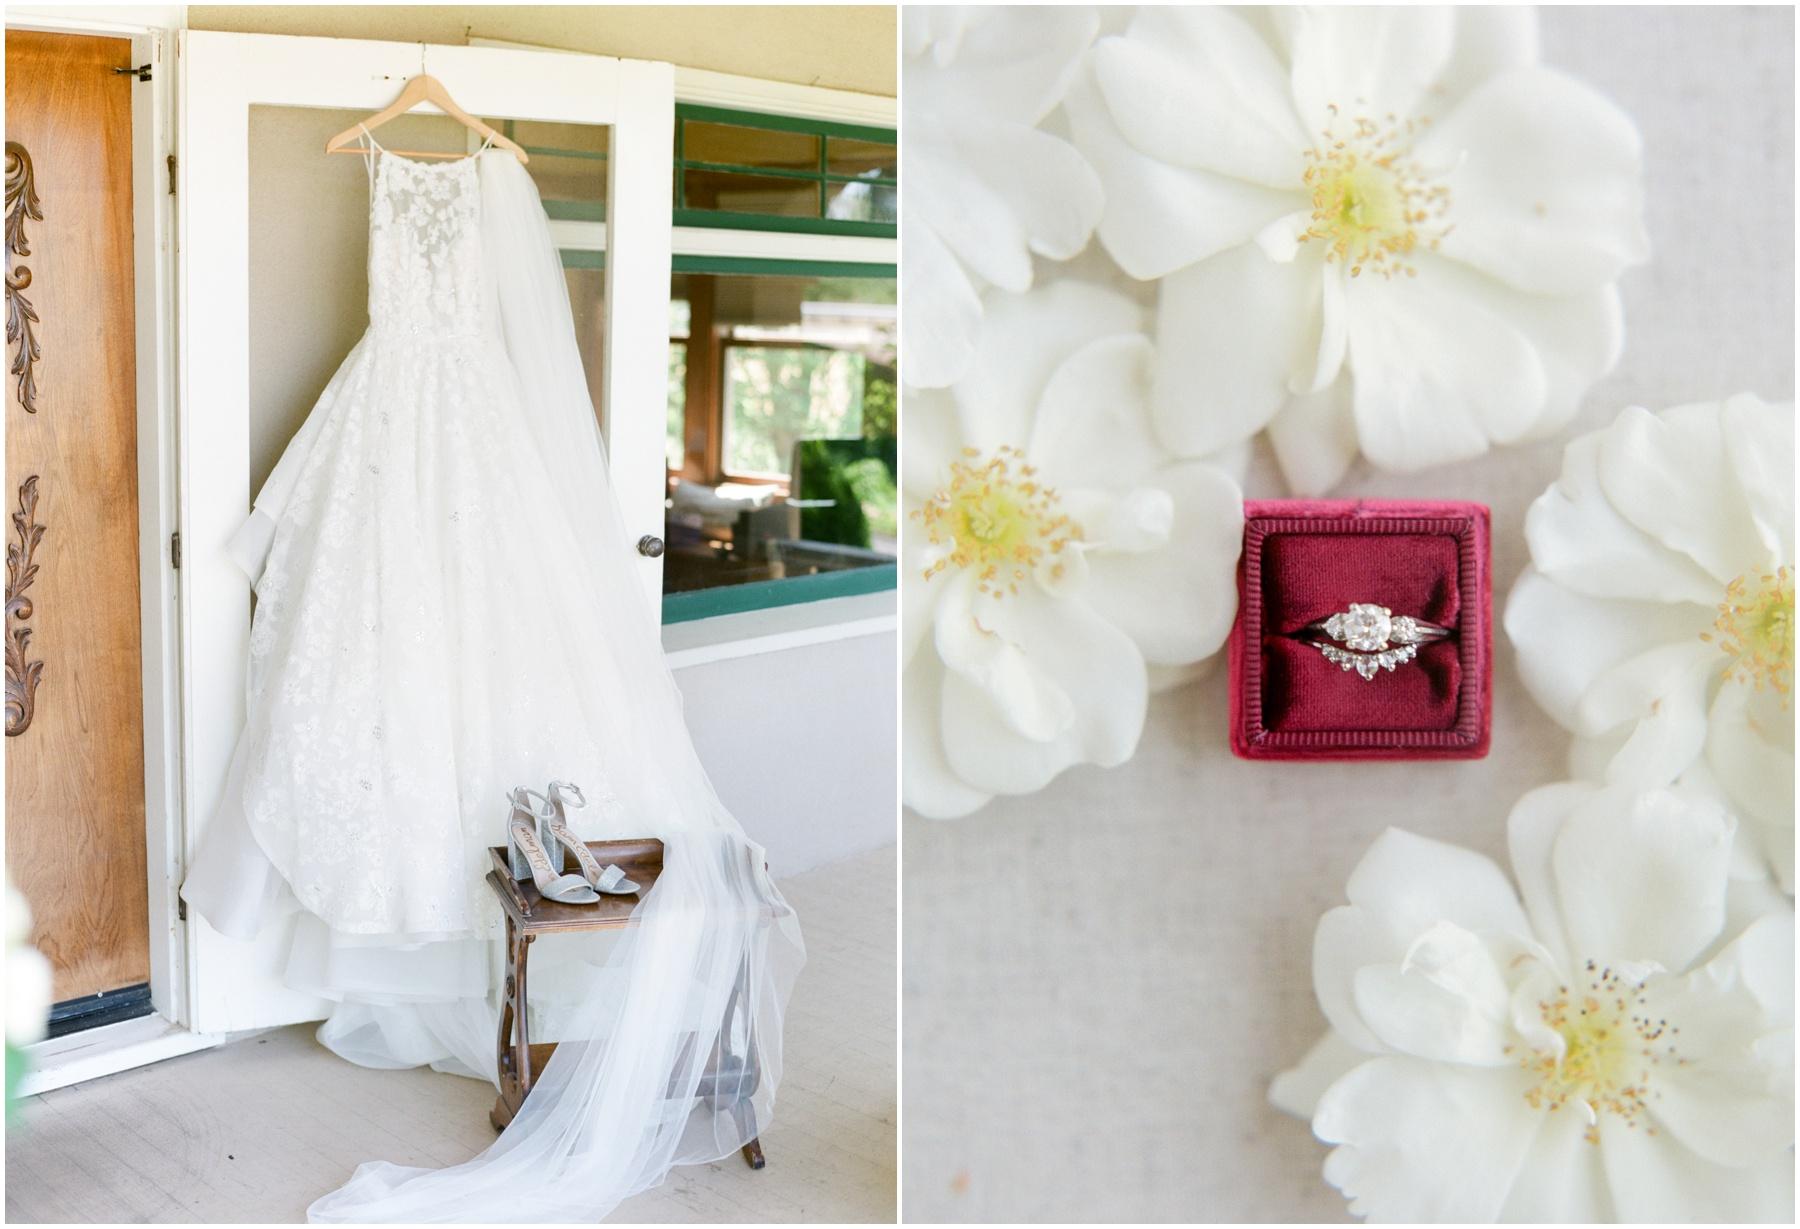 Scribner-bend-vineyards-wedding-sacramento-california-Kristine-Herman-Photography-83.jpg